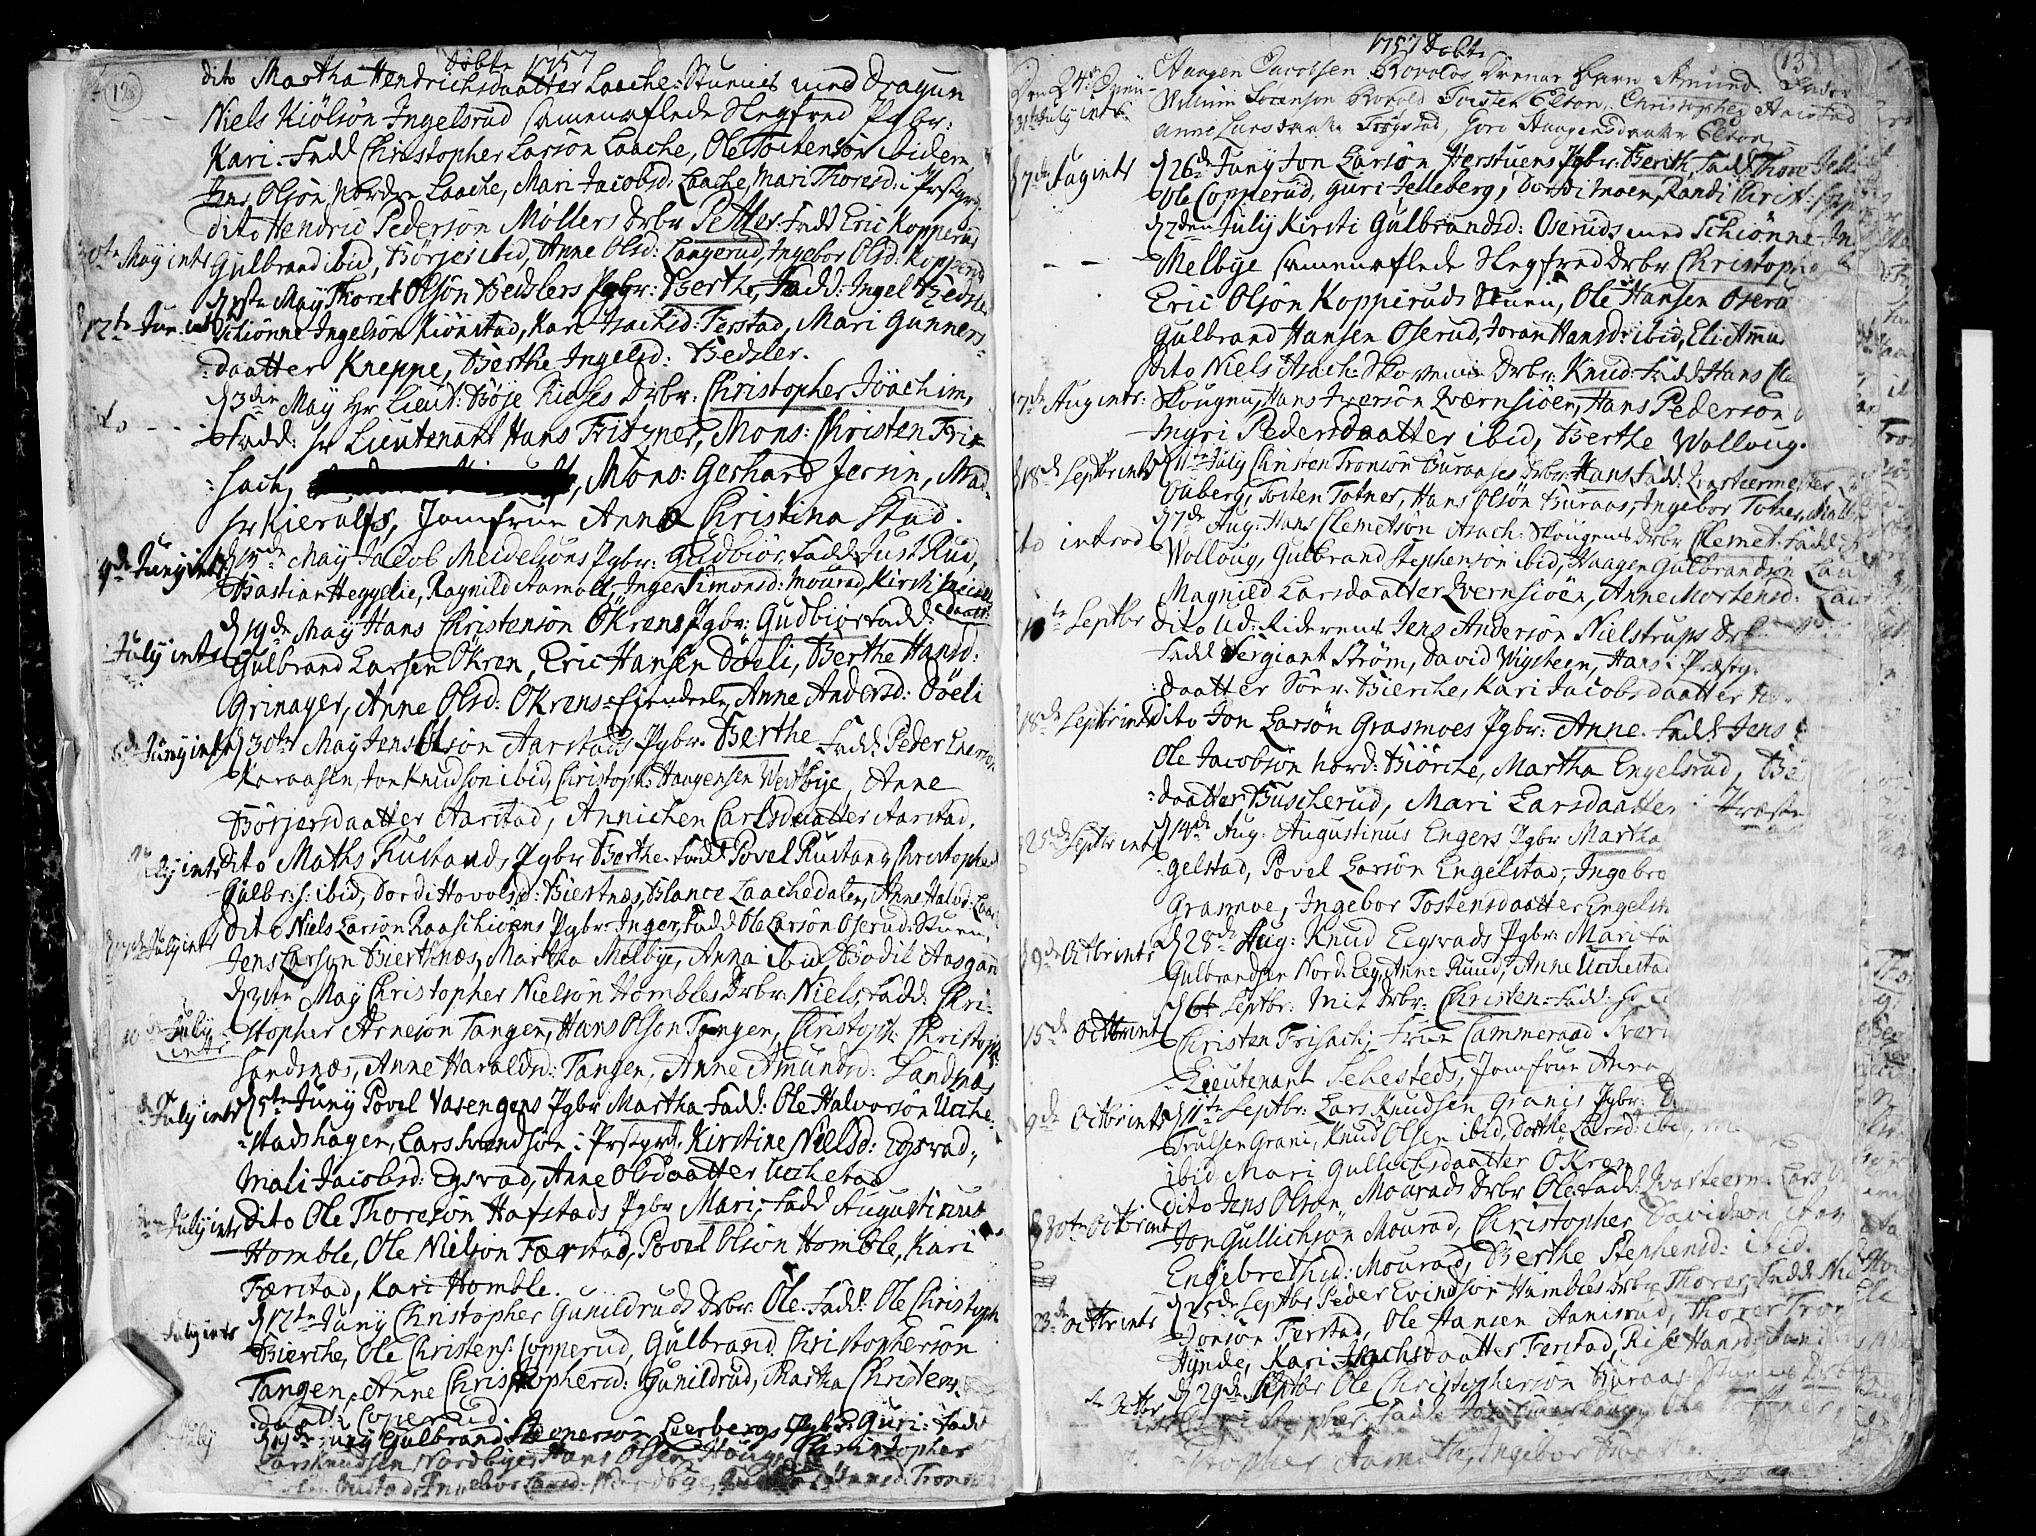 SAO, Nannestad prestekontor Kirkebøker, F/Fa/L0007: Ministerialbok nr. I 7, 1754-1791, s. 12-13